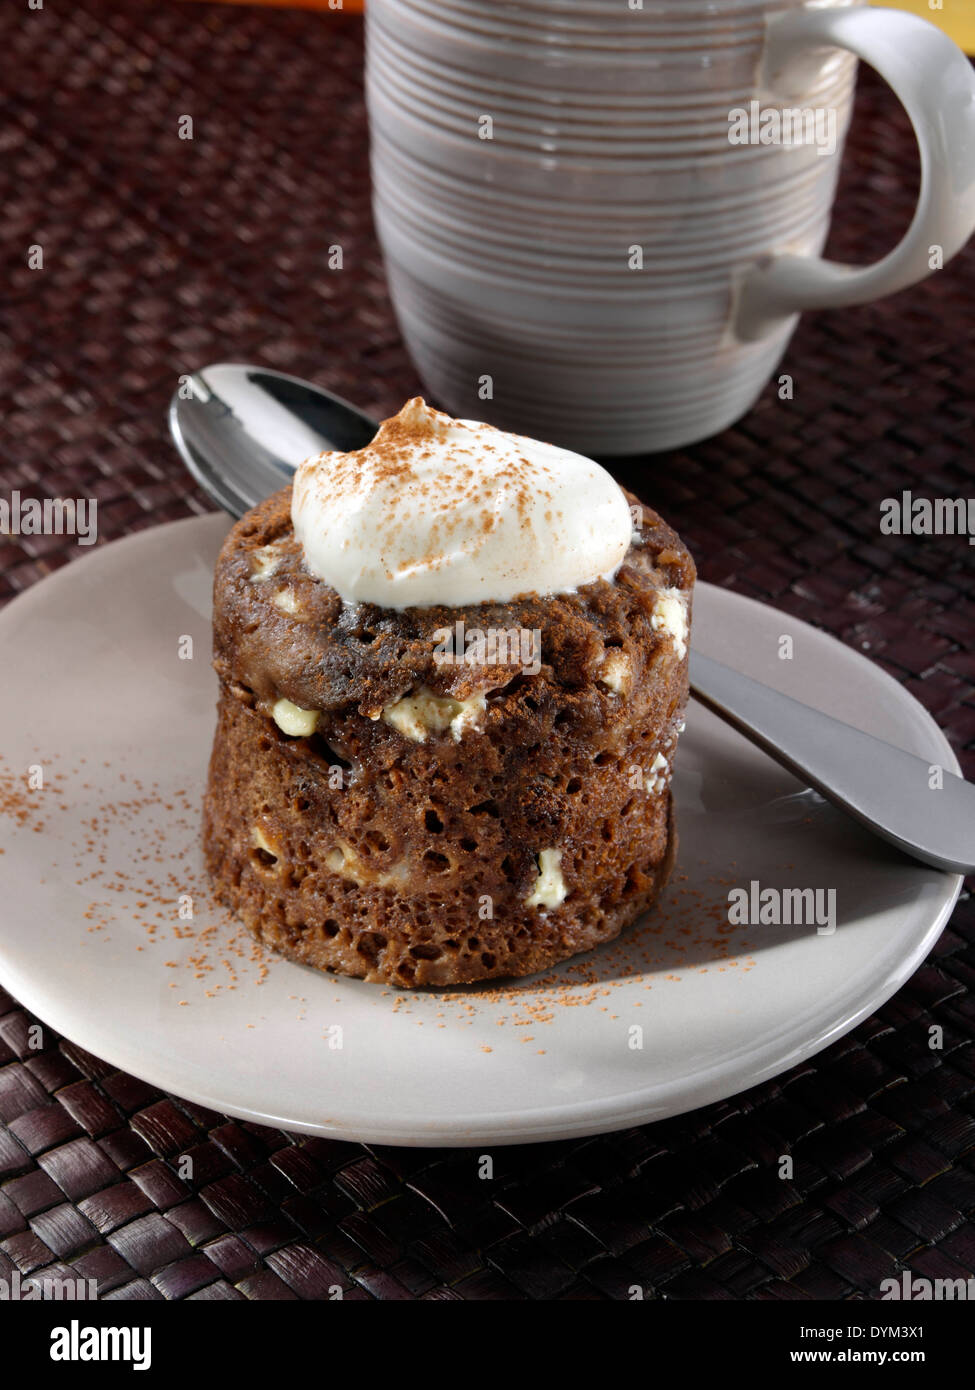 Microwaved chocolate pudding in a mug - Stock Image